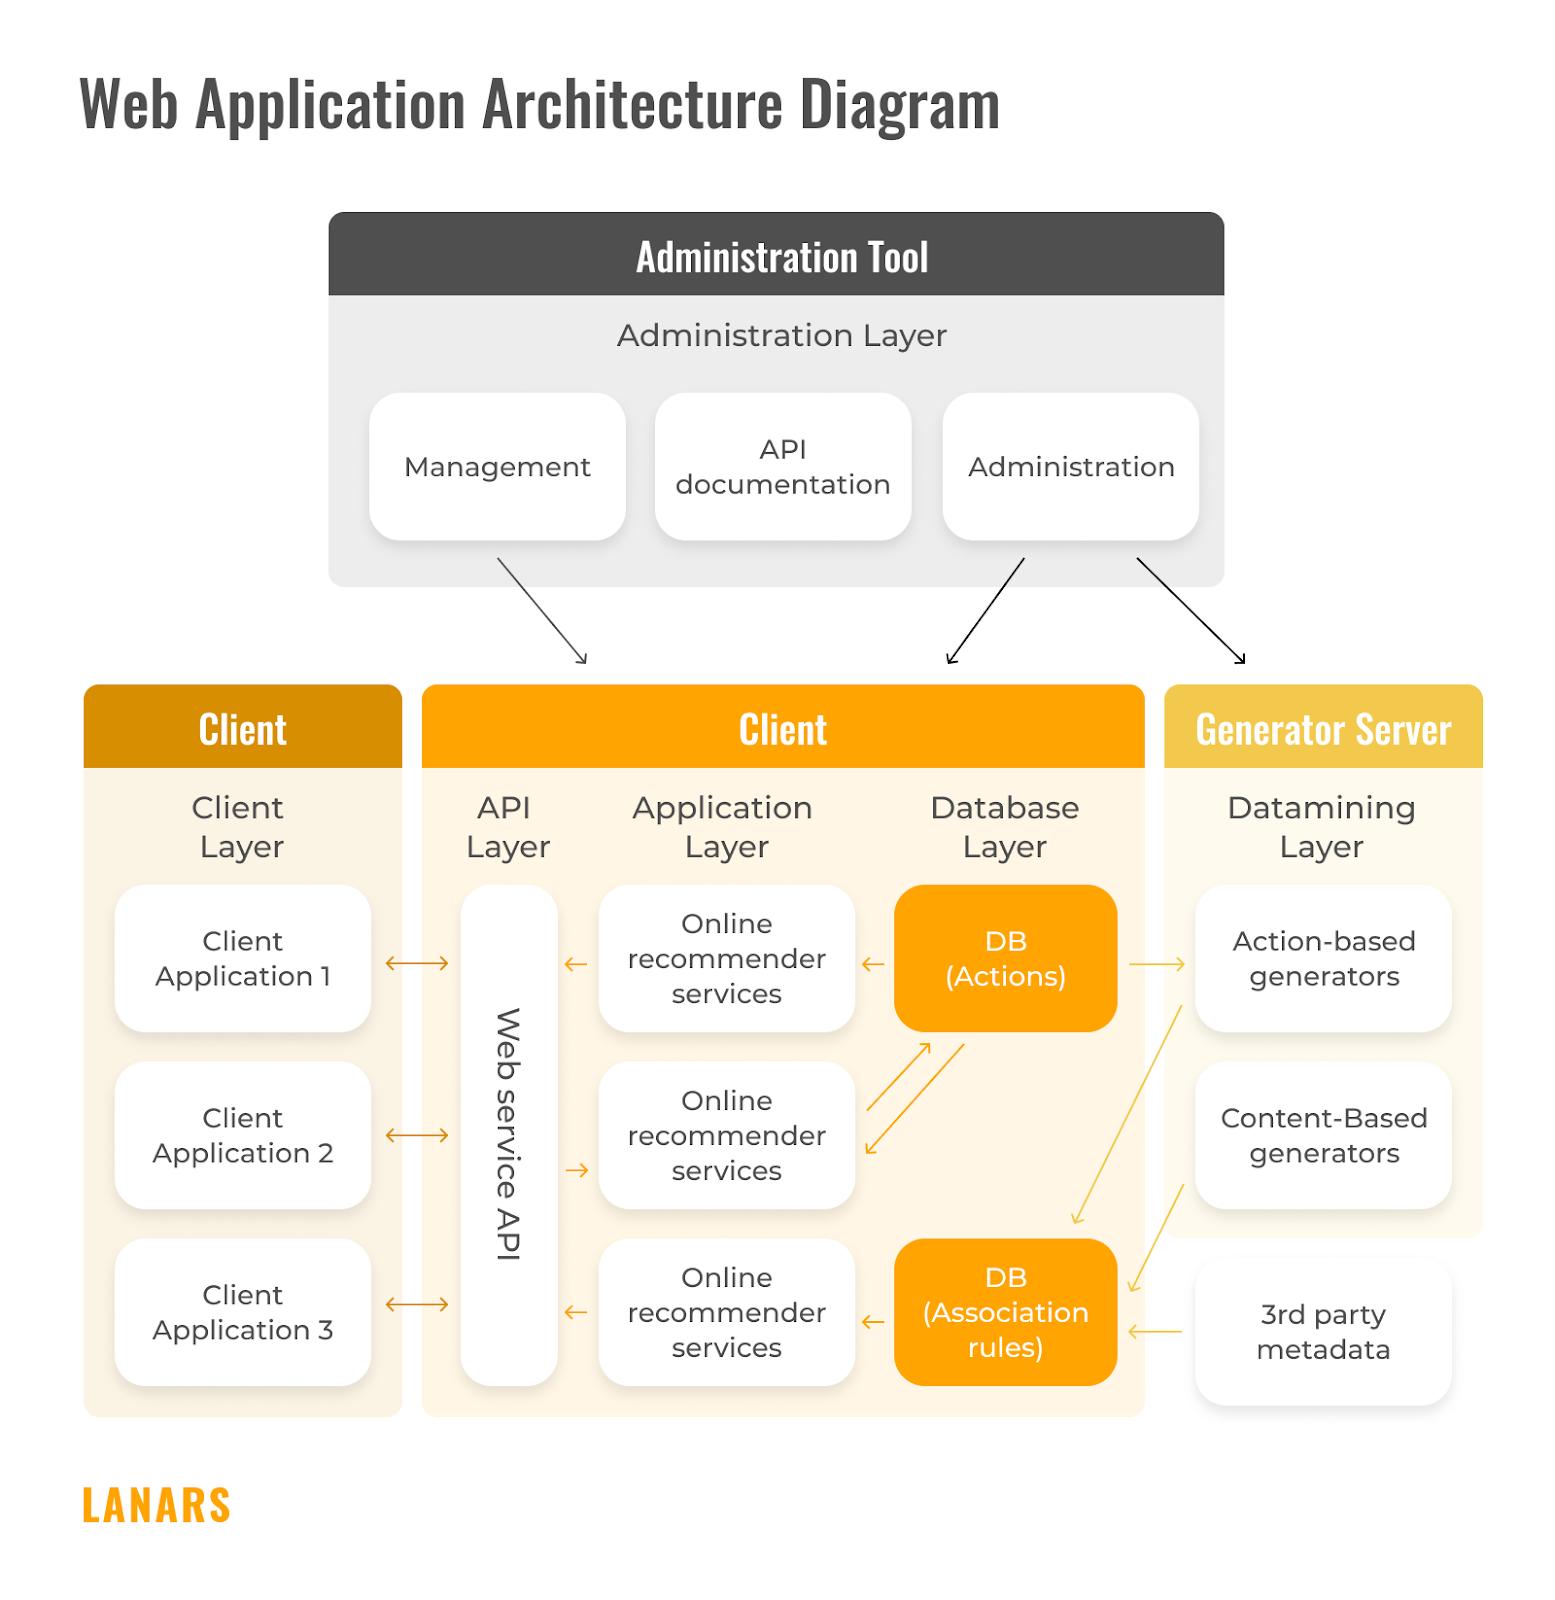 Web Application Architecture Diagram